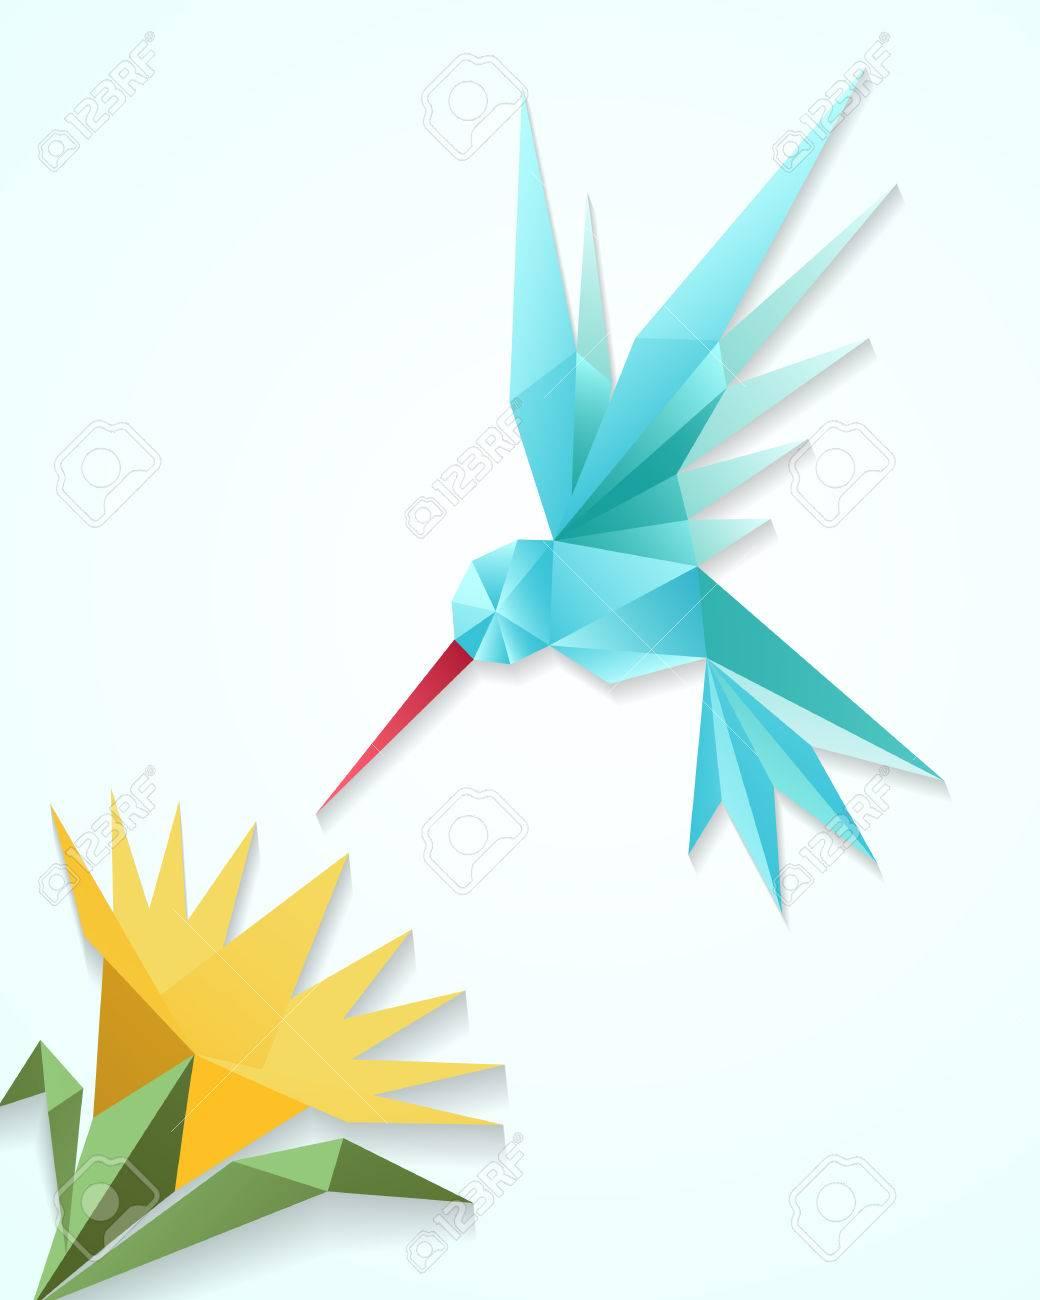 An Easy-to-fold Origami Hummingbird | 1300x1040